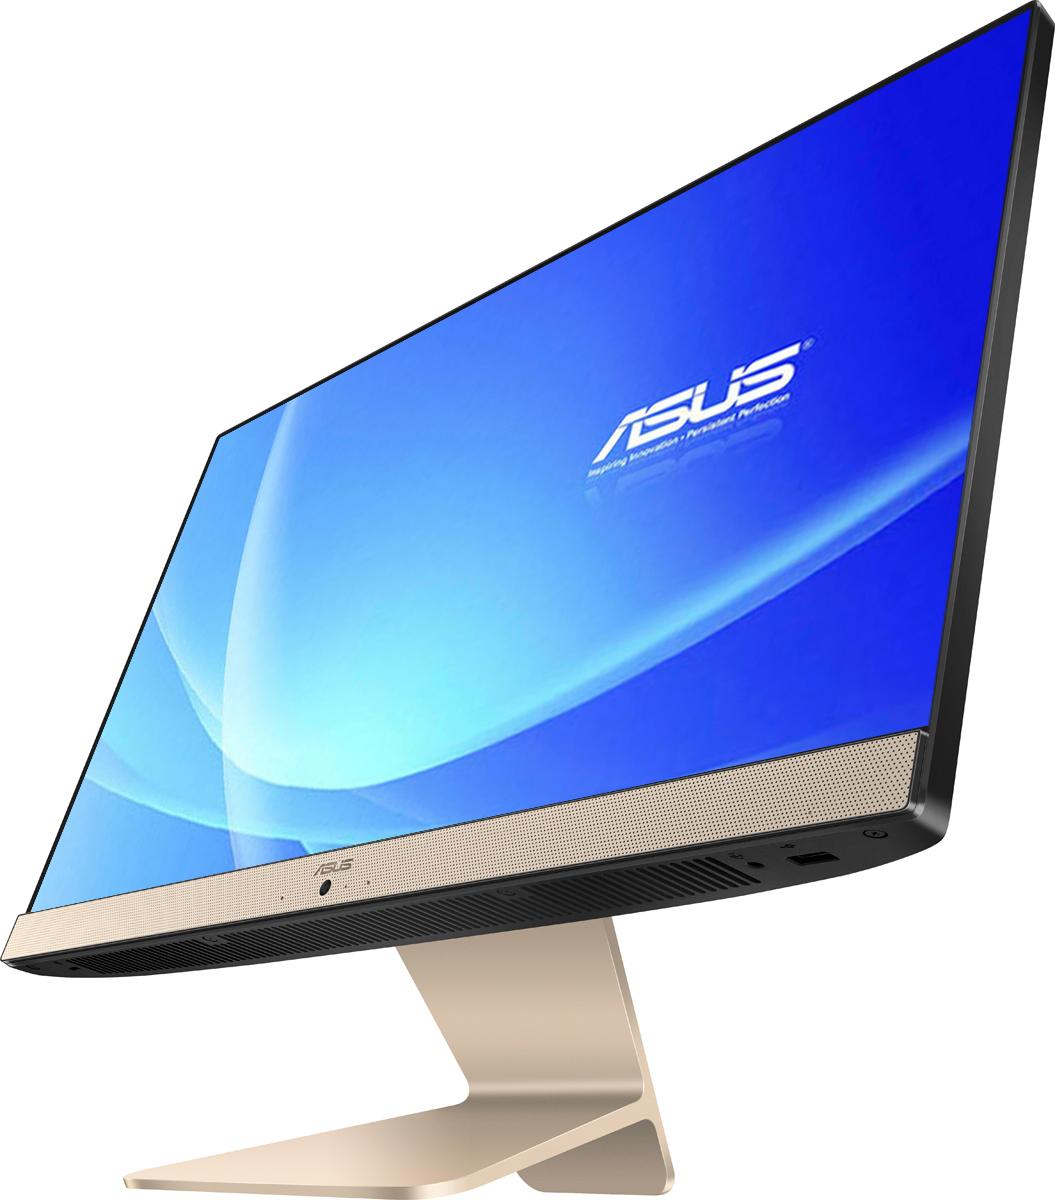 Моноблок ASUS Vivo AiO V222GBK, 90PT0221-M00300, 21.5, черный